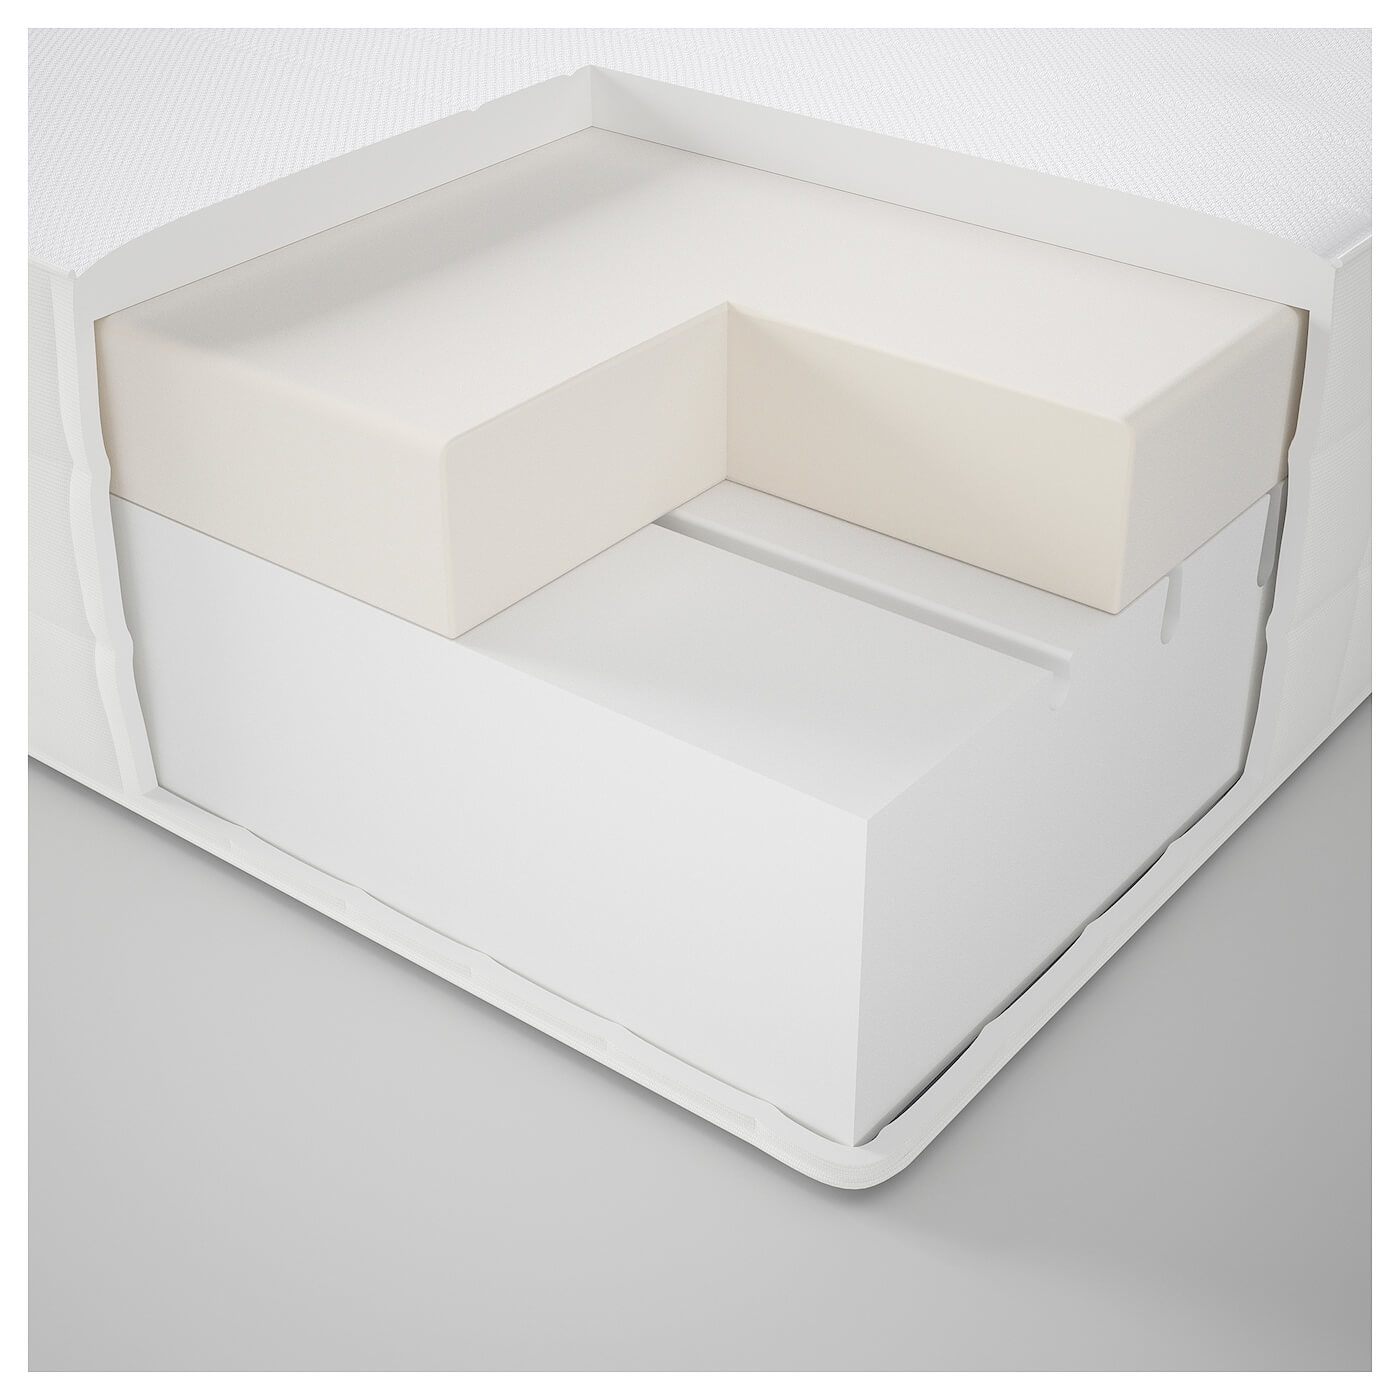 ikea matrand memoryschaummatratze im test 2019. Black Bedroom Furniture Sets. Home Design Ideas